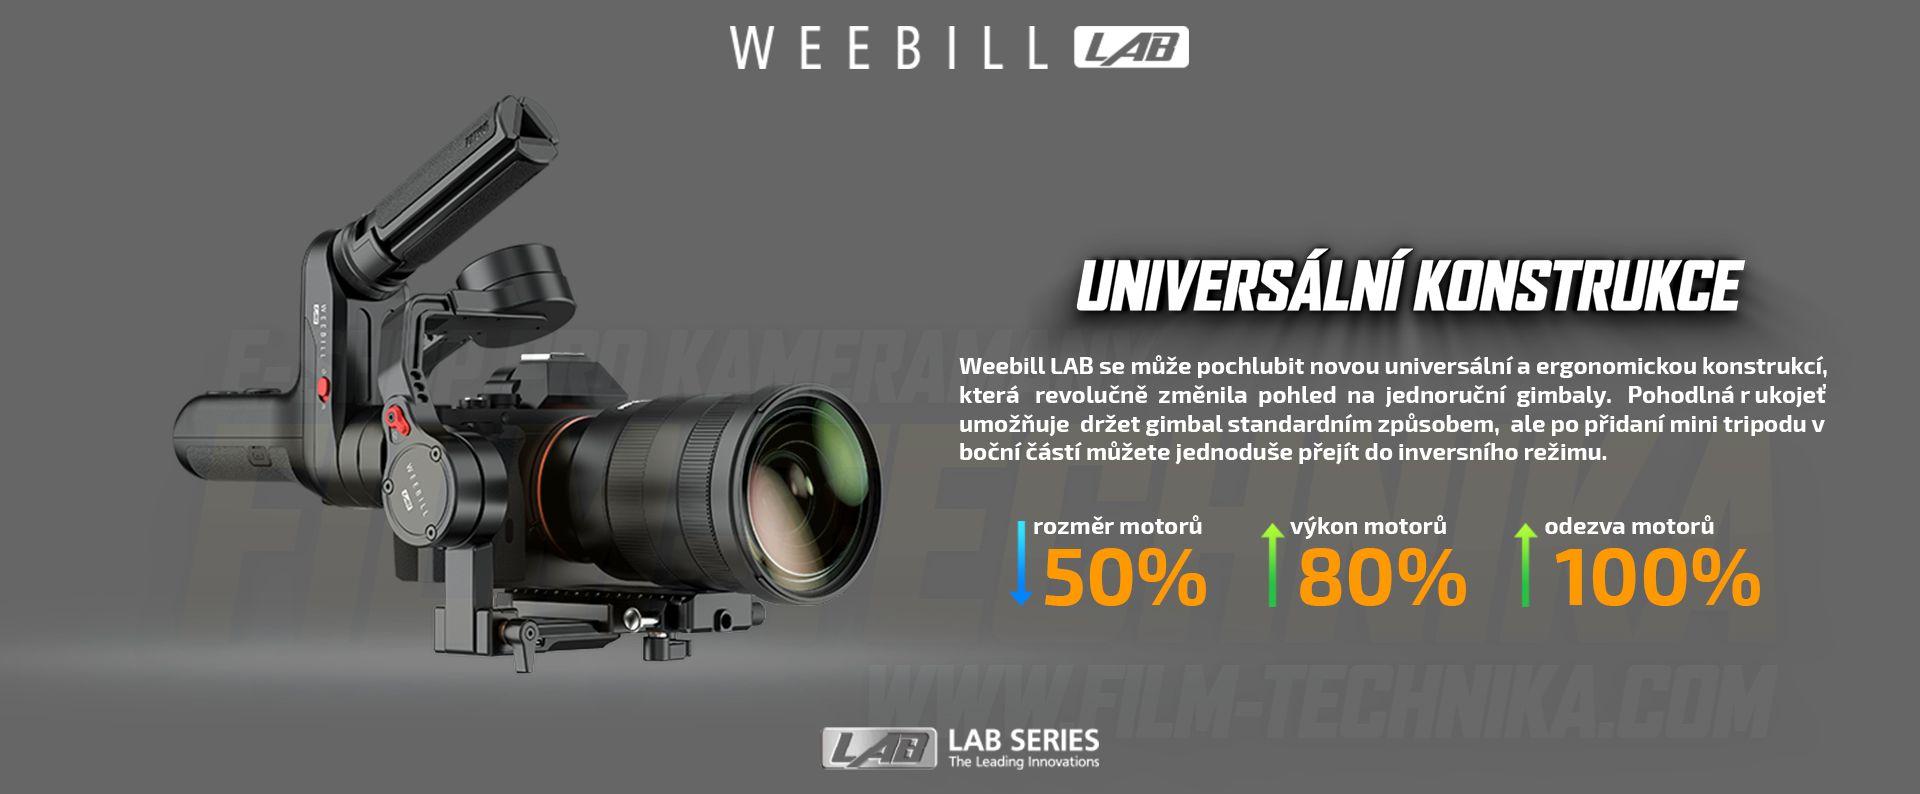 film-technika-zhiyun-weebill-lab-intext6